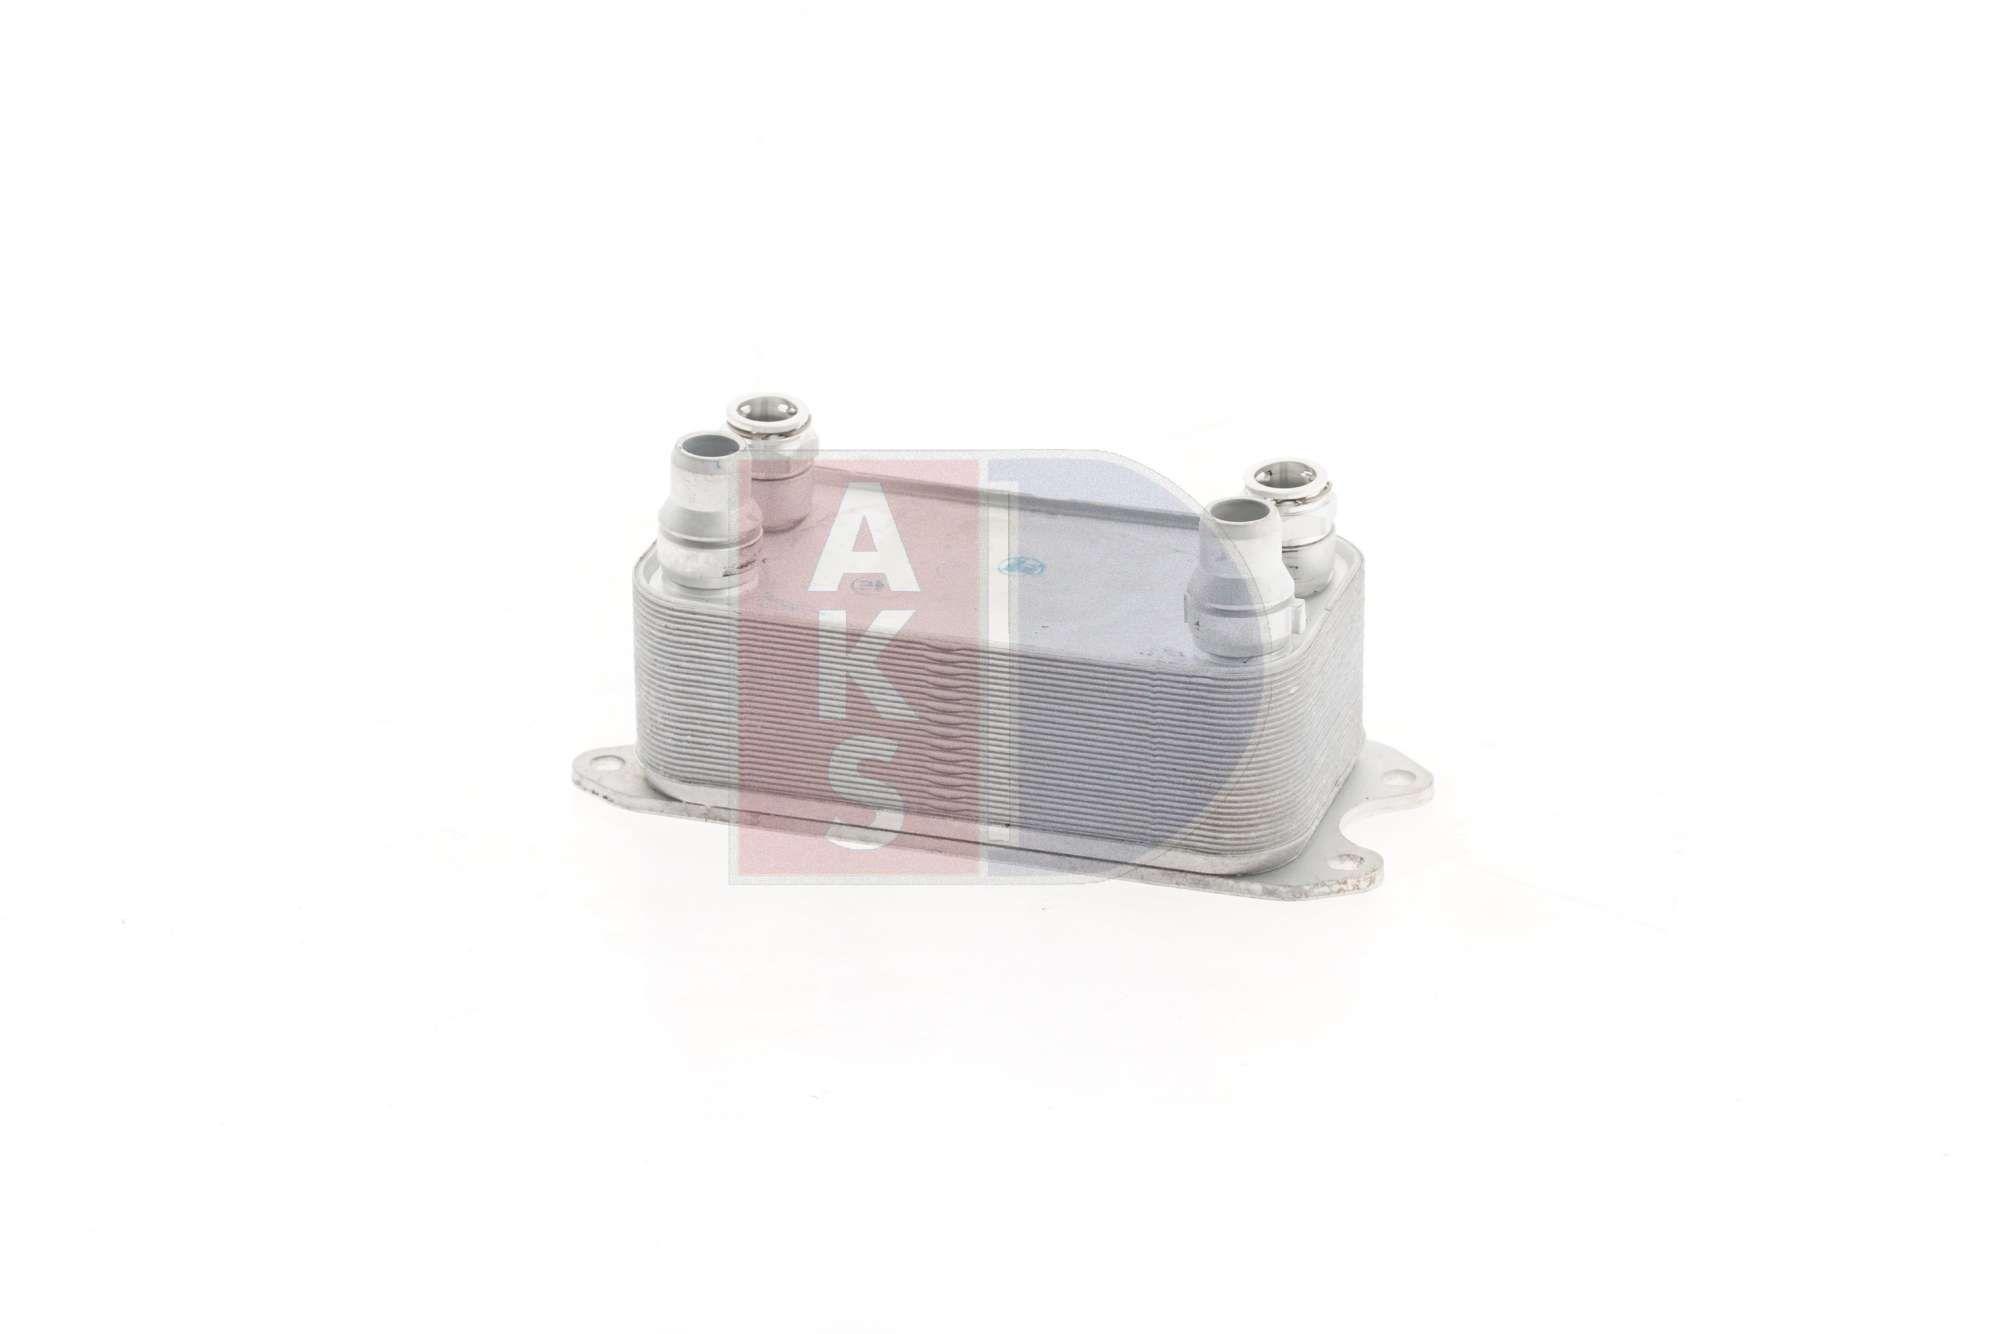 Automatikgetriebe Ölkühler Mercedes W212 2014 - AKS DASIS 126013N ()